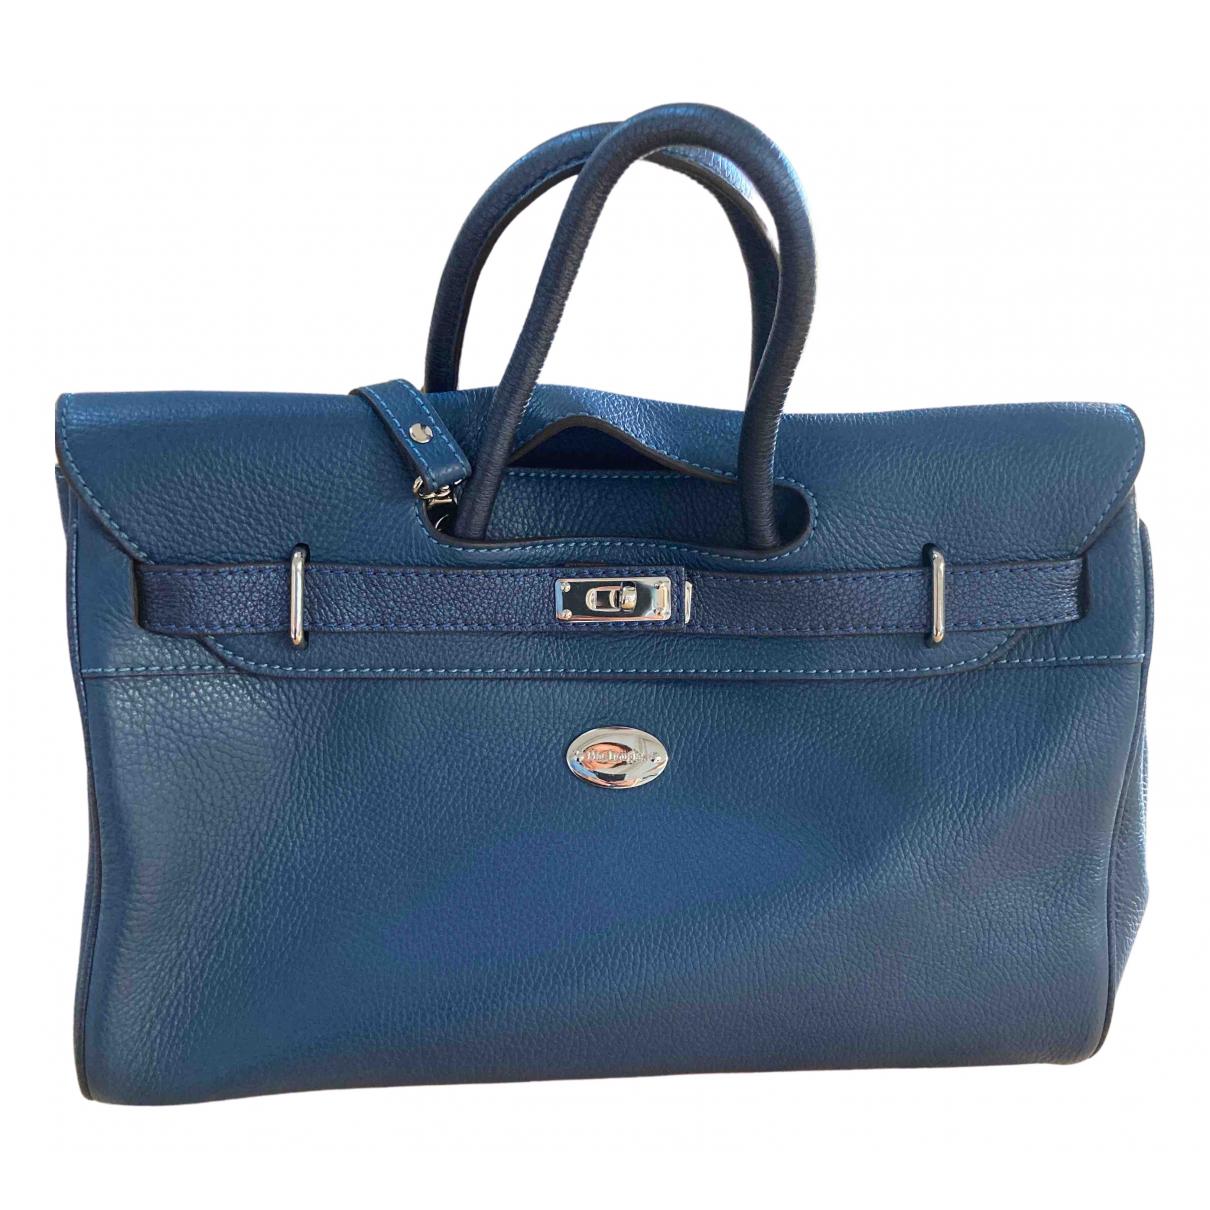 Mac Douglas \N Blue Leather handbag for Women \N